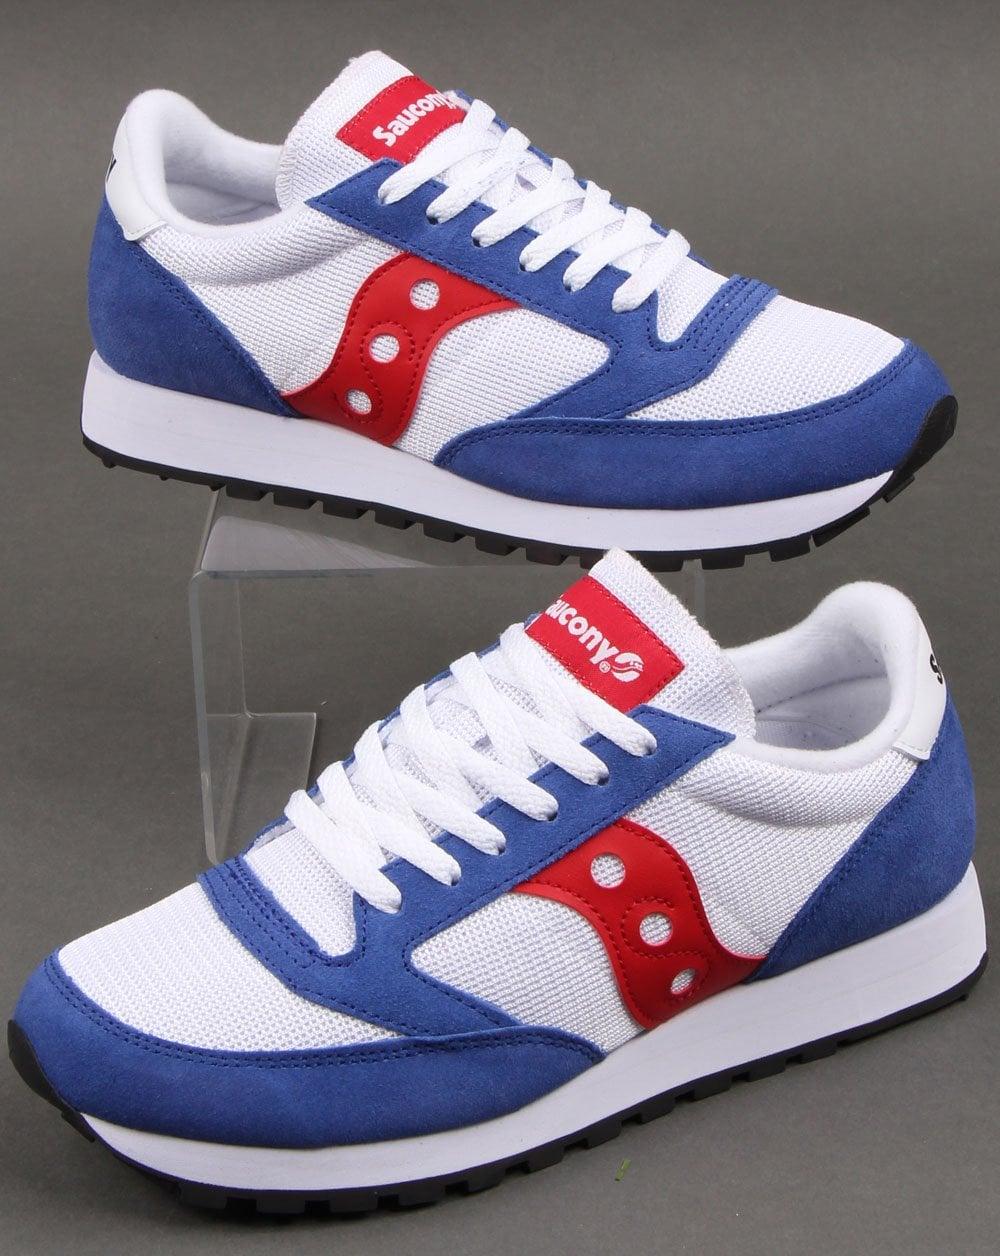 purchase cheap ea510 ec53d Saucony Jazz Original Vintage Trainers White/Blue/Red